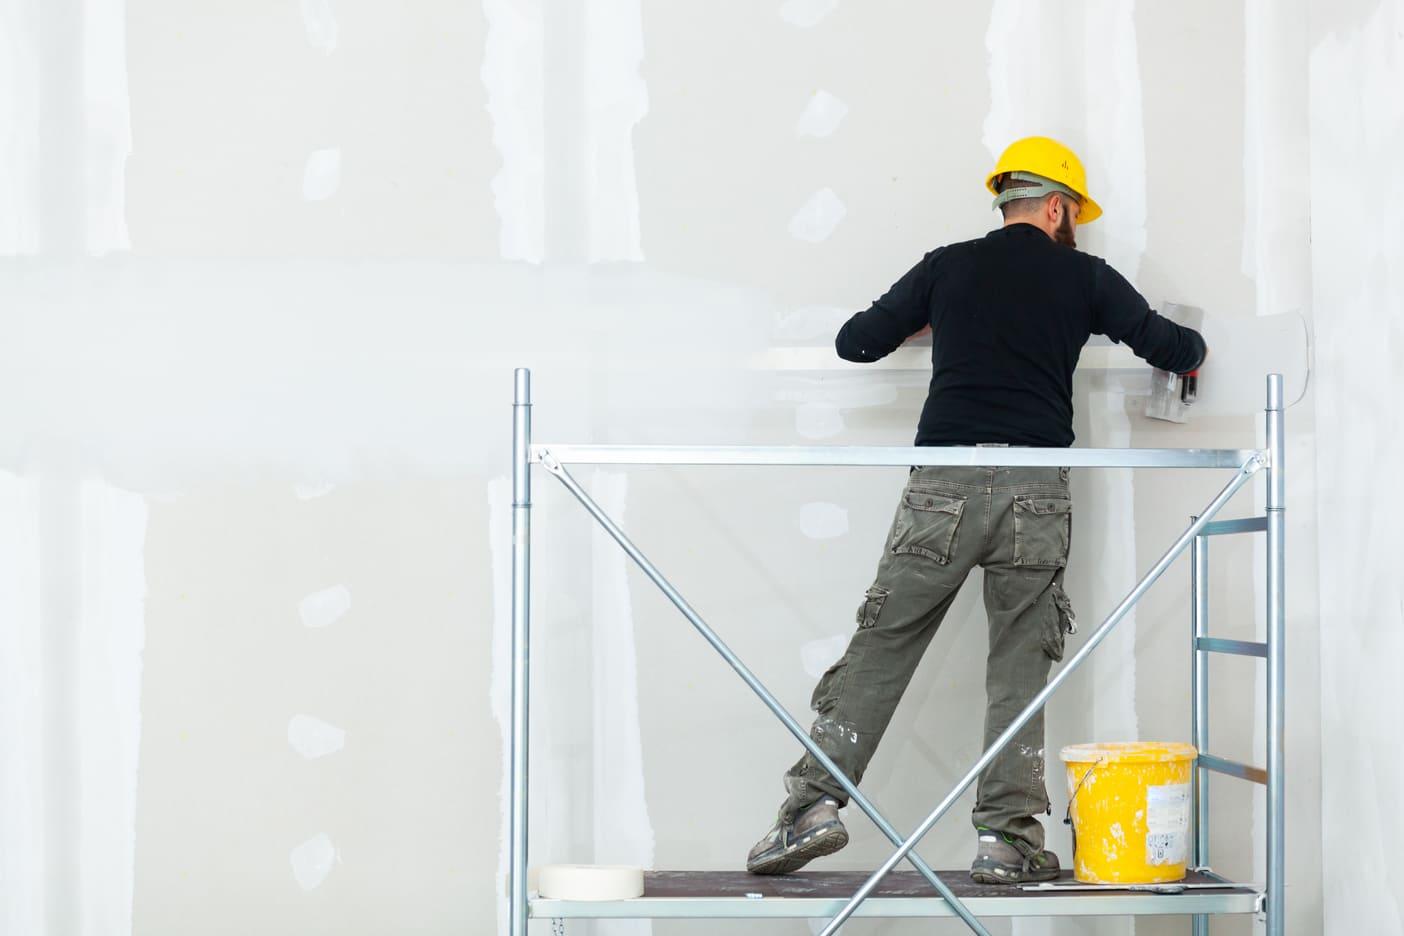 plastering-gypsum-board-wall